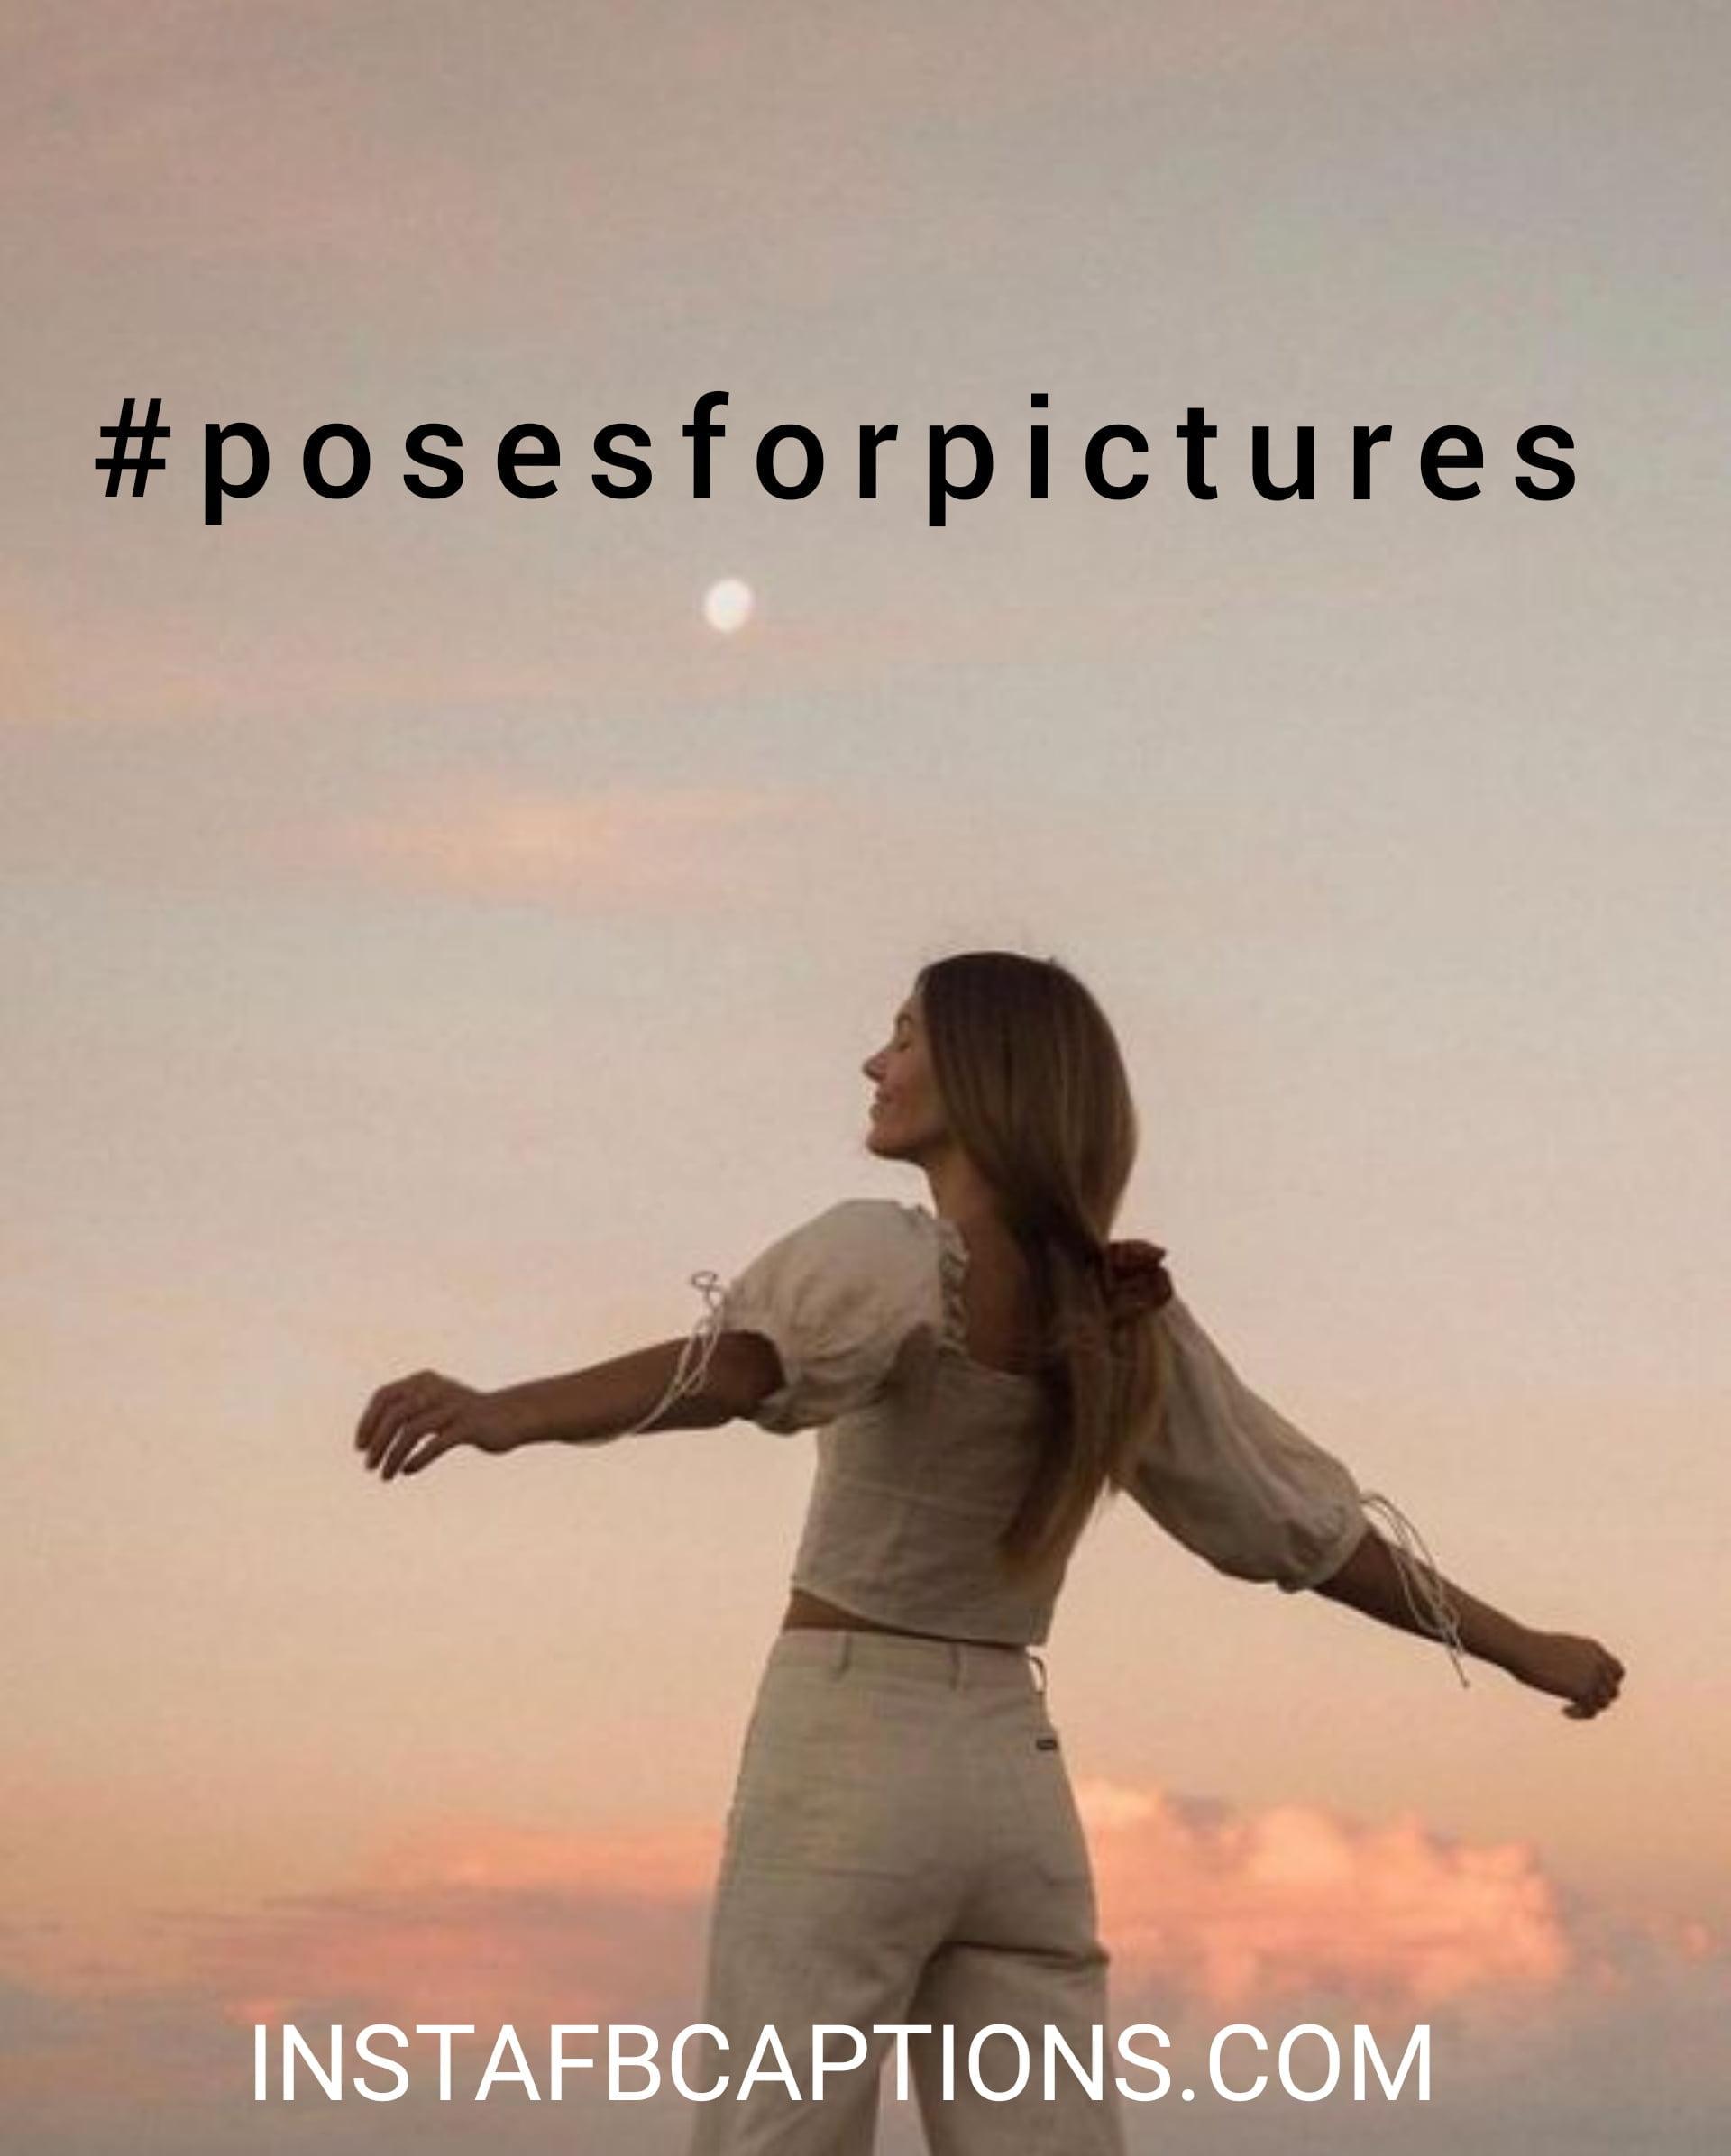 Standing Pose Hashtags  - Standing Pose Hashtags - 150+ STANDING POSE Instagram Captions 2021